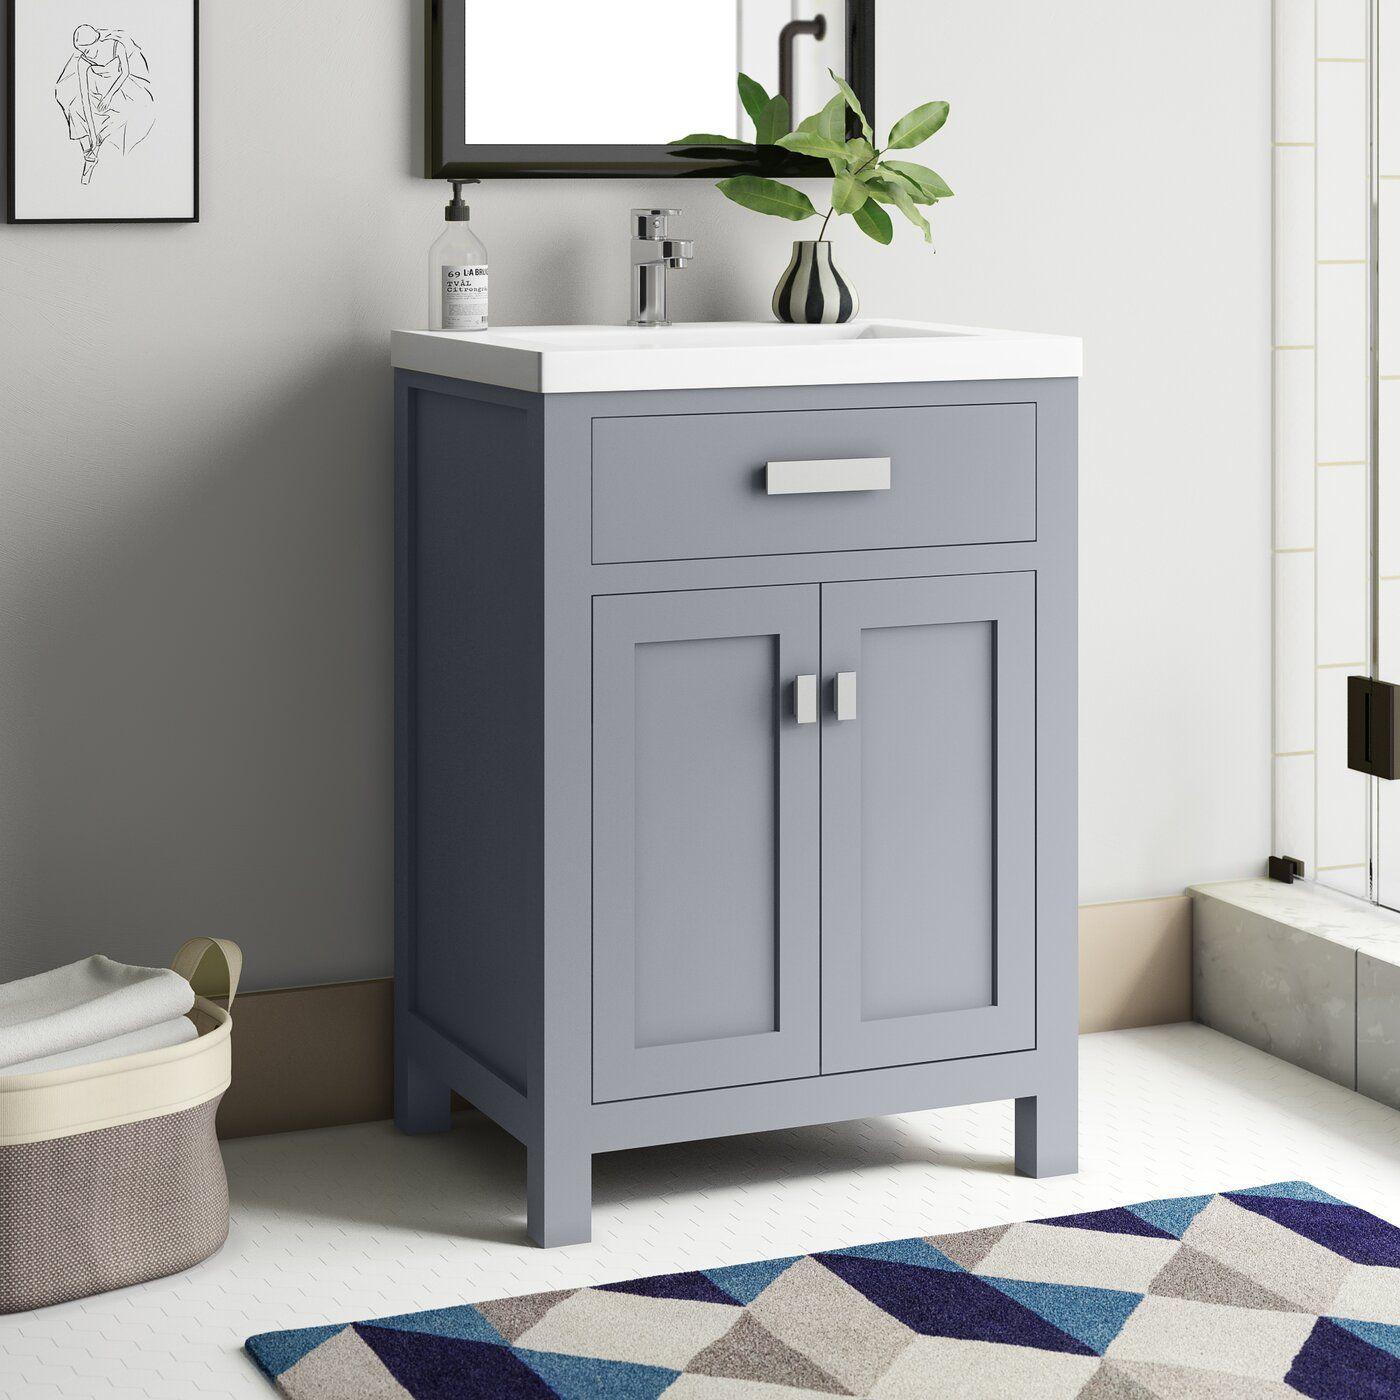 Zipcode Design Knighten 24 Single Bathroom Vanity Set Reviews Wayfair Small Bathroom Vanities Cheap Bathrooms Small Bathroom Makeover